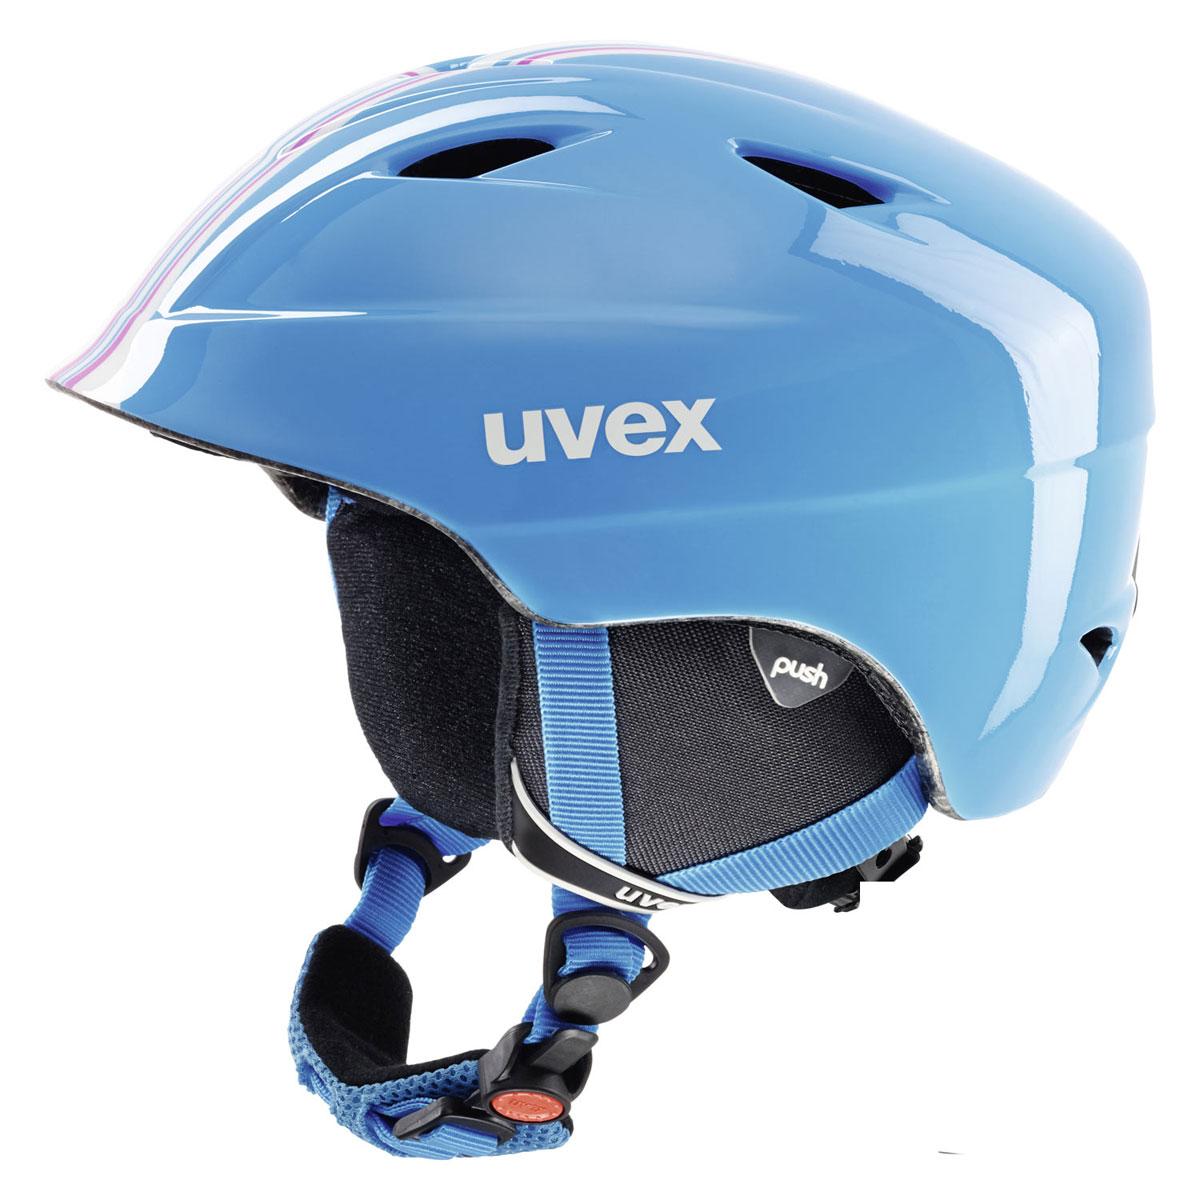 "Шлем зимний Uvex ""Airwing 2"", детский, цвет: голубой. Размер S S566192-4903_голубой"